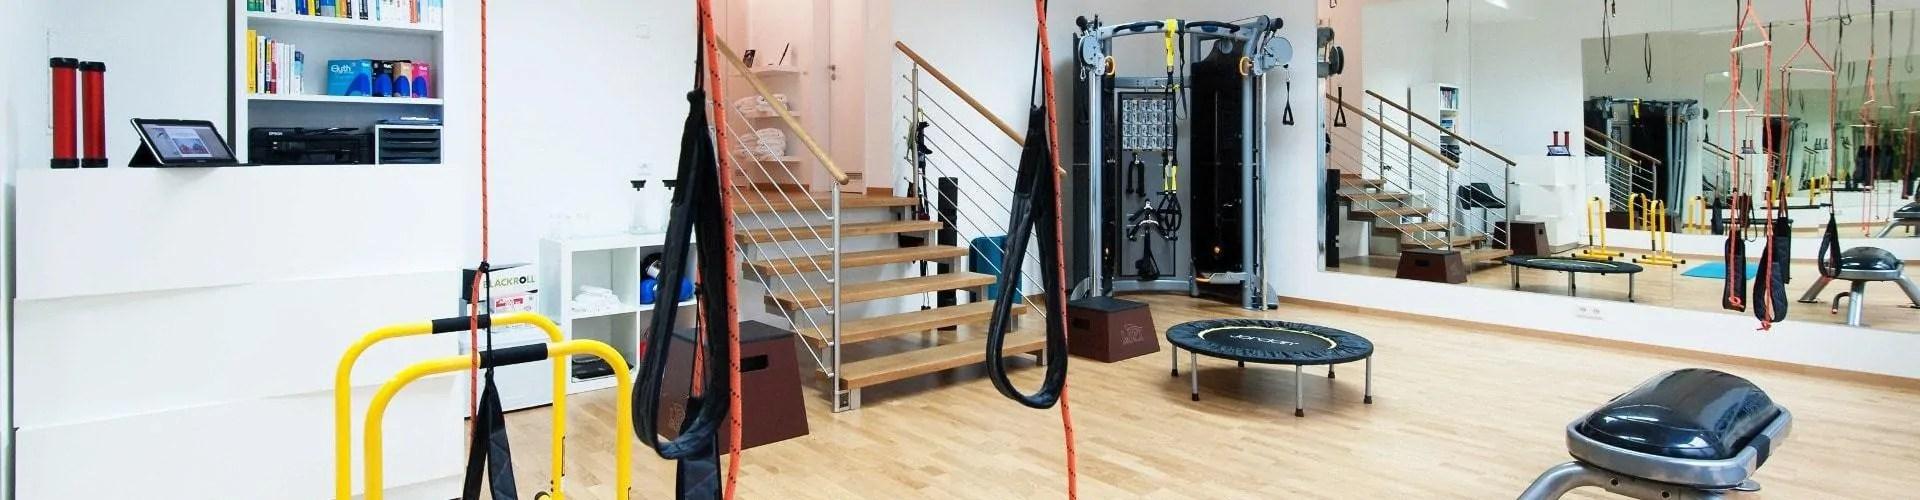 Fitness Studio Bi PHiT Rumfordstr